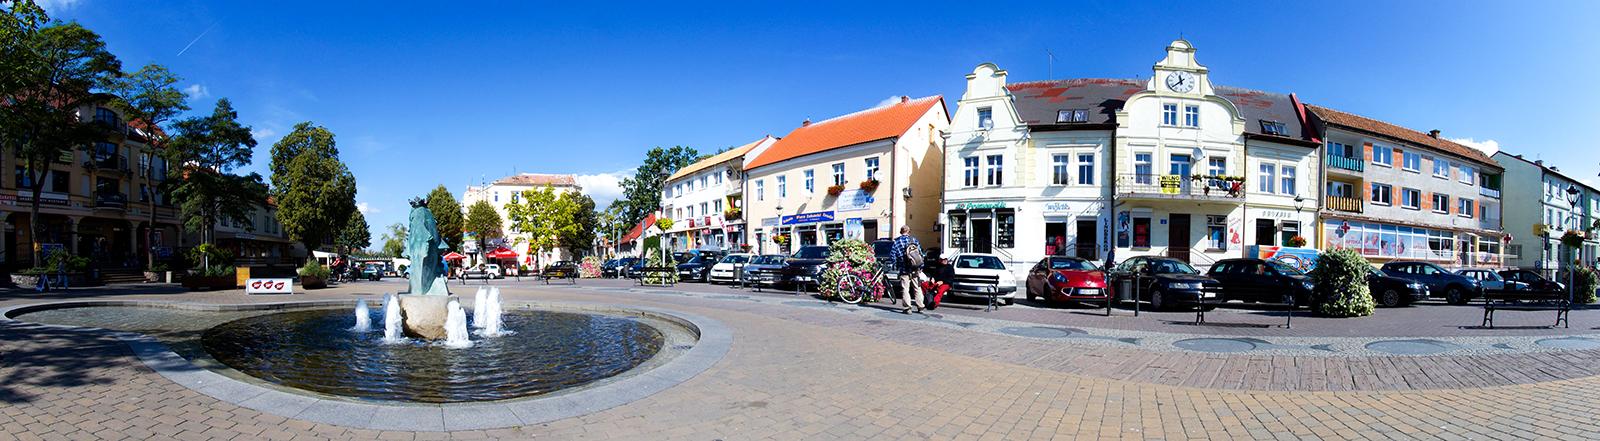 centrum Mikołajek